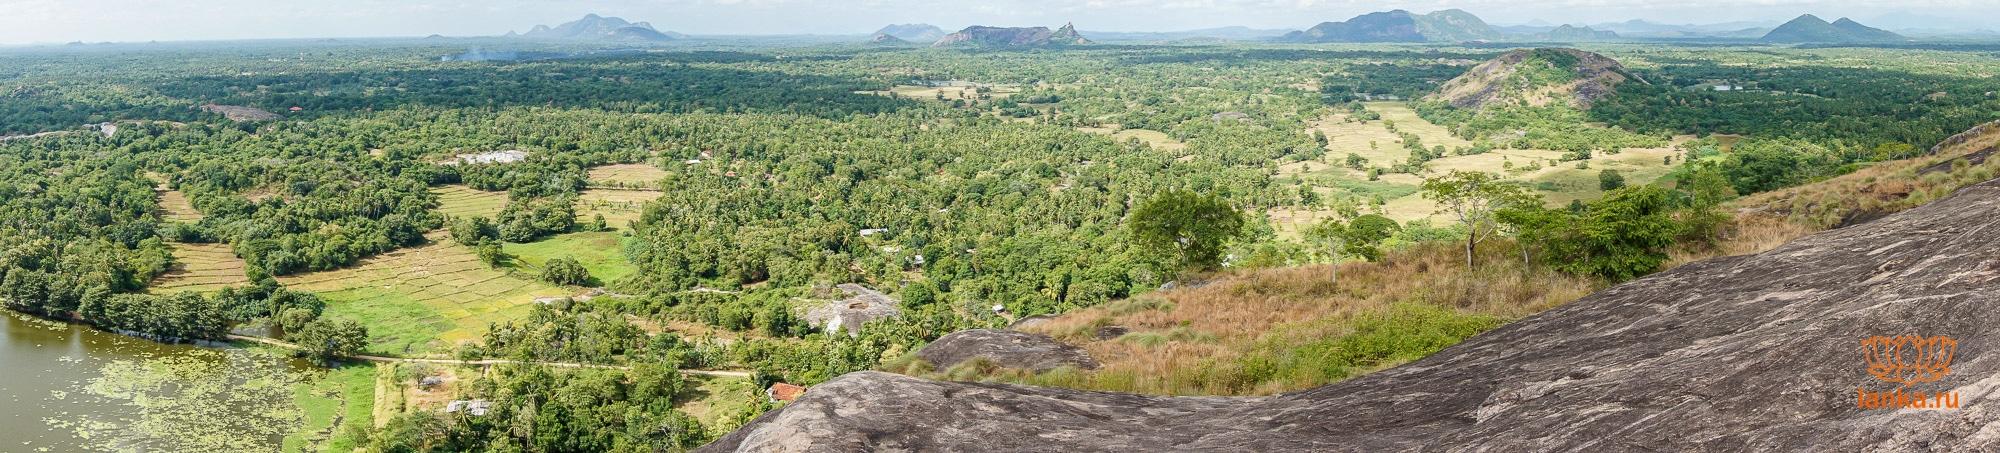 Панорама со скалы Япахува (Yapahuwa)